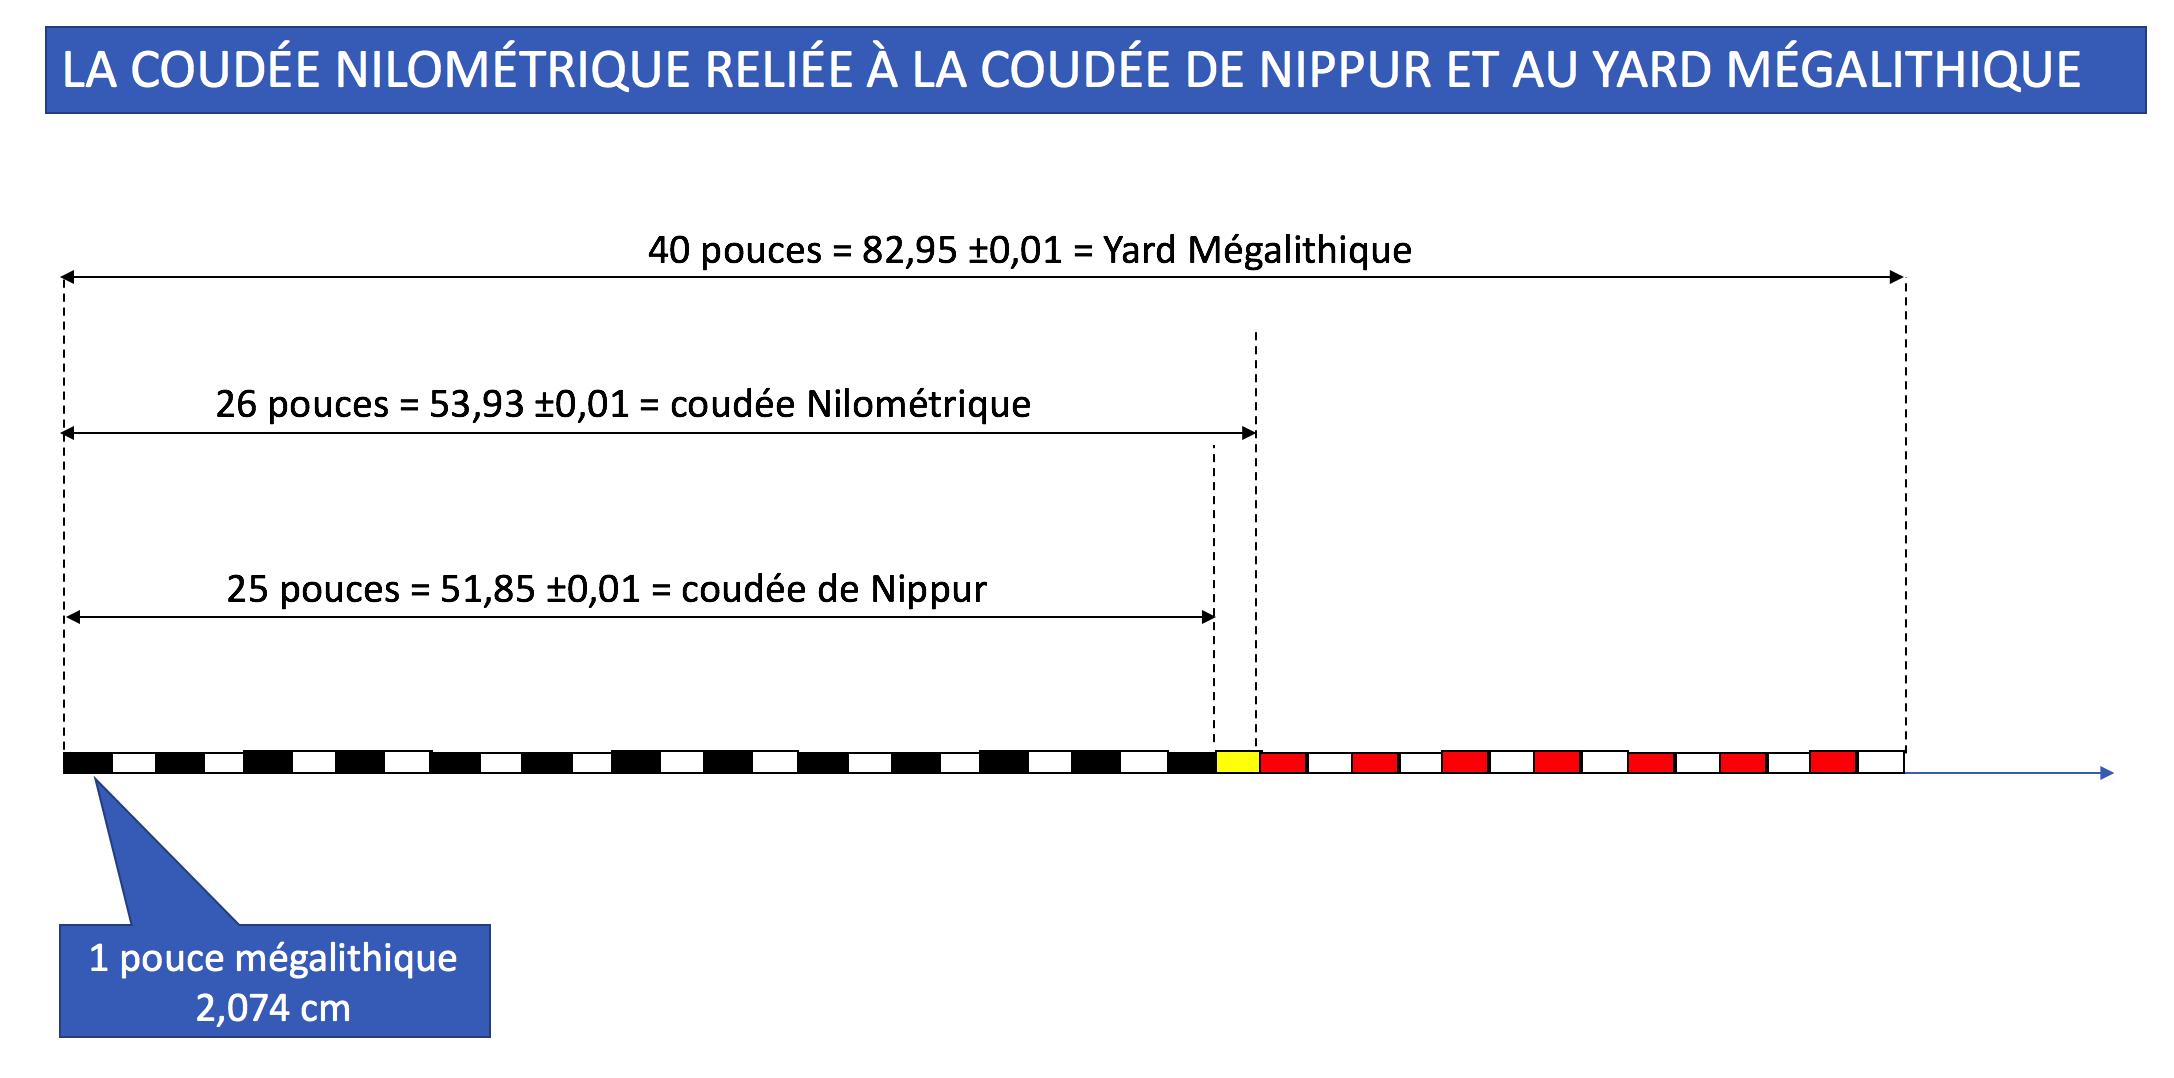 2017-10-18 22:21:41